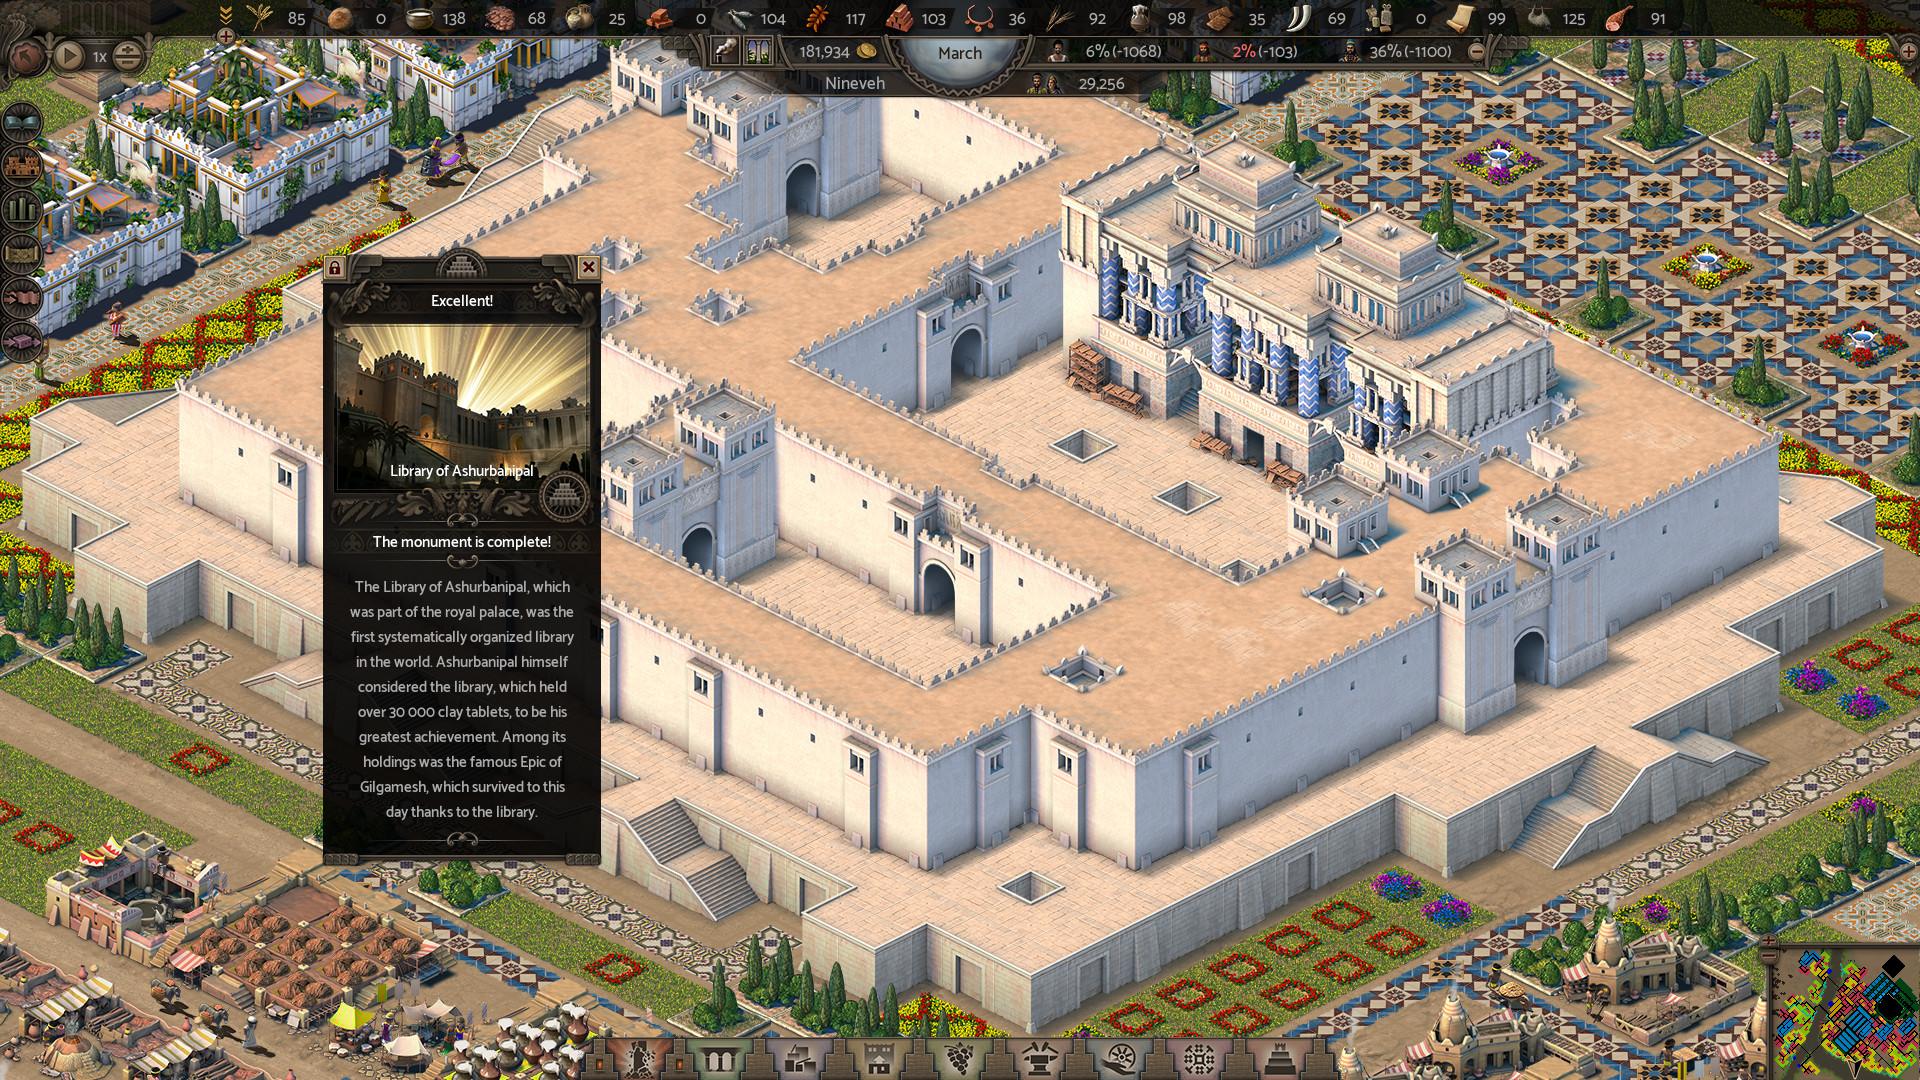 nebuchadnezzar-pc-screenshot-02